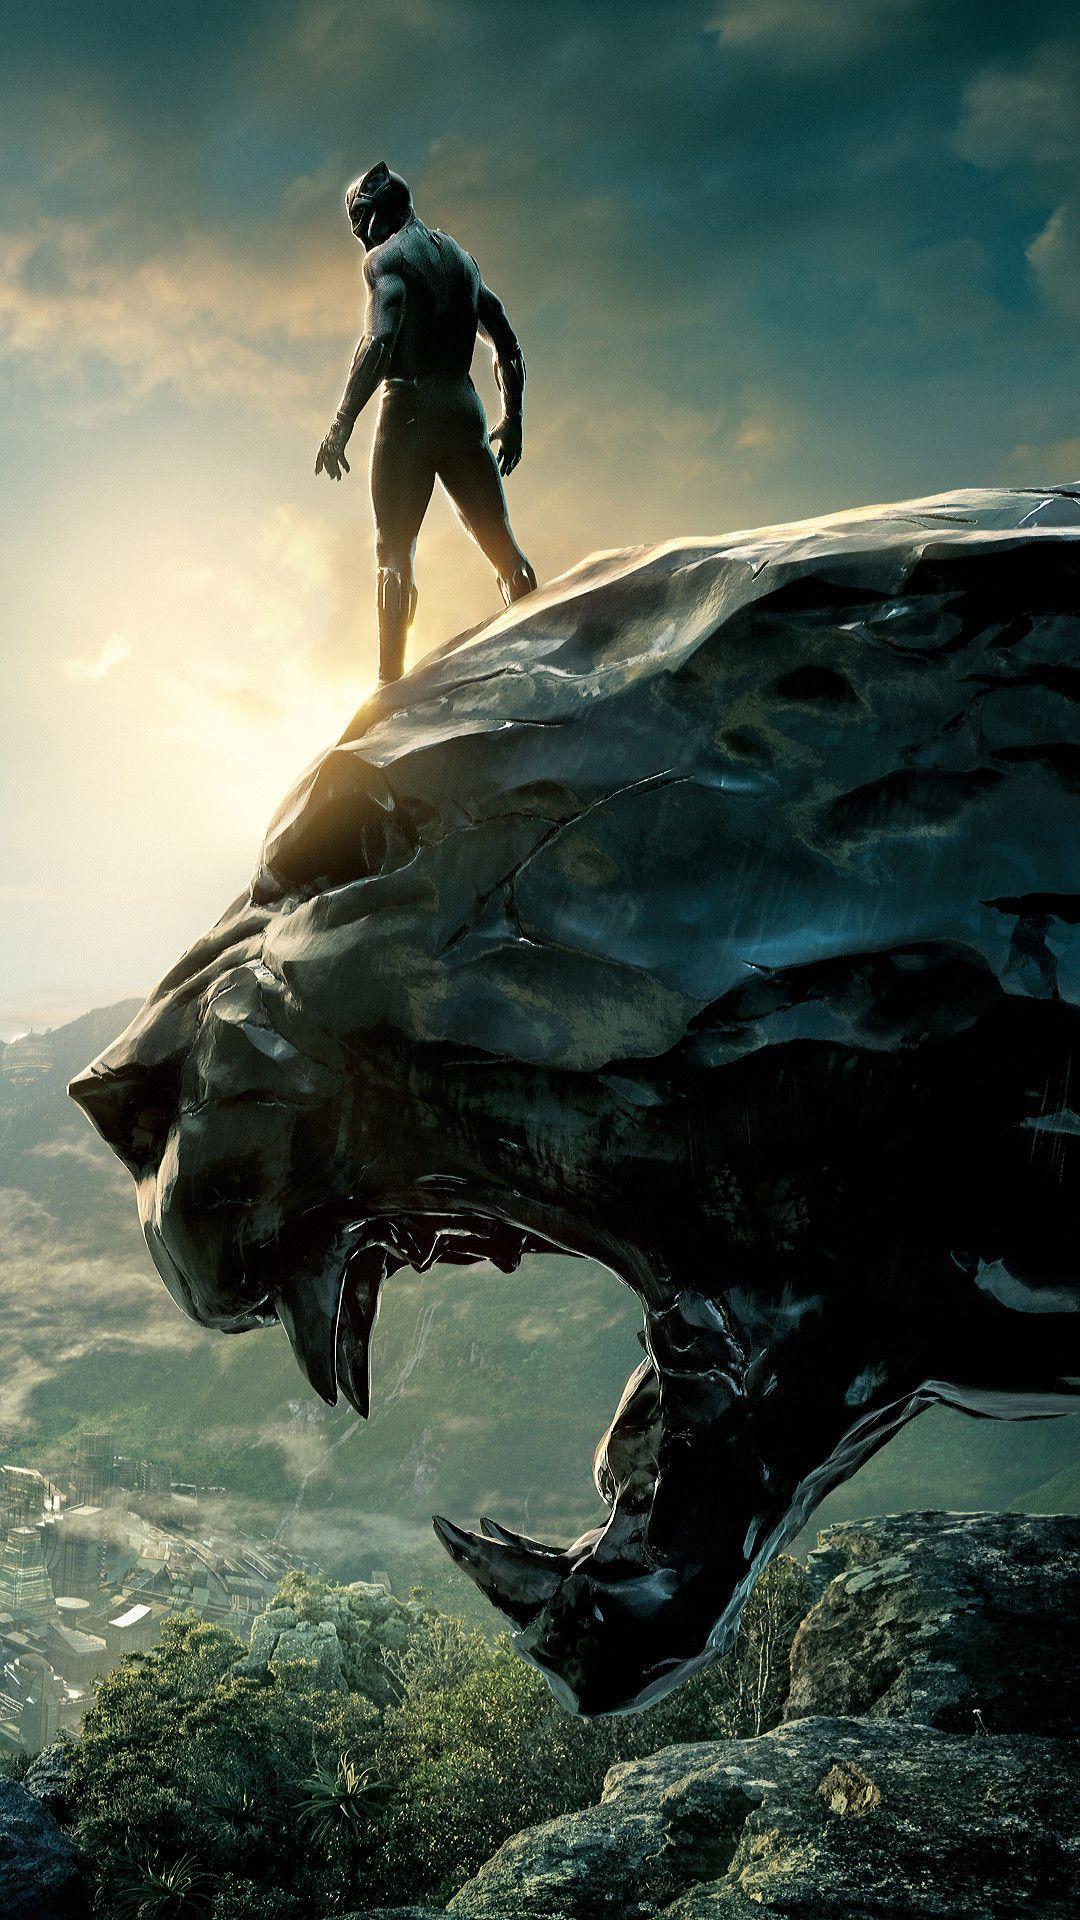 Iphone Xr Wallpaper 4k Nature Mywallpapers Site Black Panther Marvel Black Panther Hd Wallpaper Marvel Superhero Posters